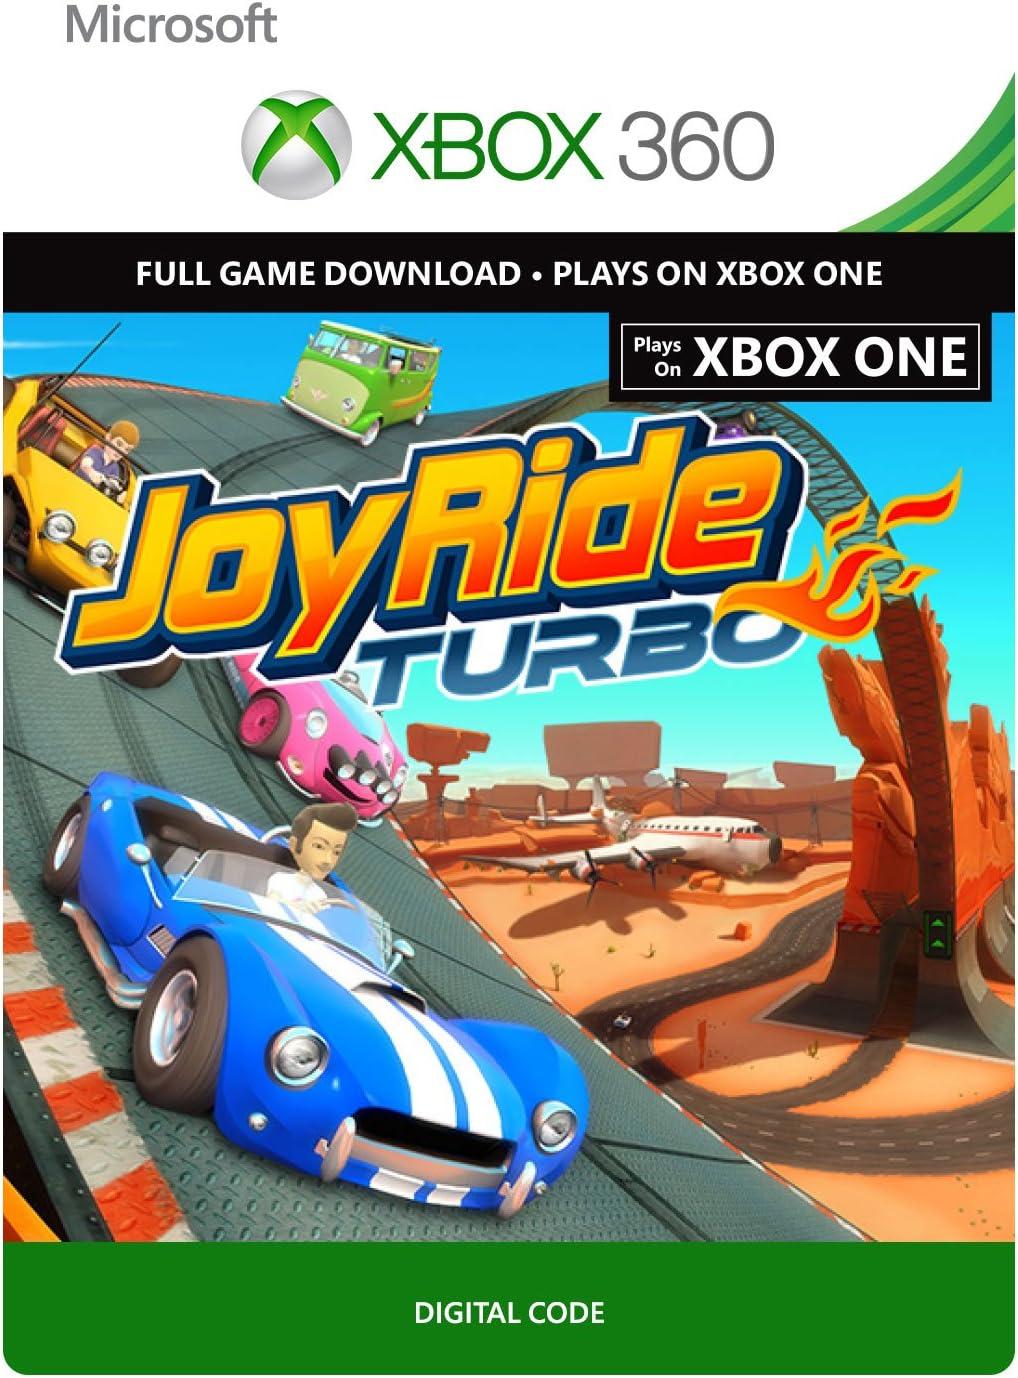 Amazon.com: Joy Ride Turbo - Xbox 360 Digital Code: Video Games